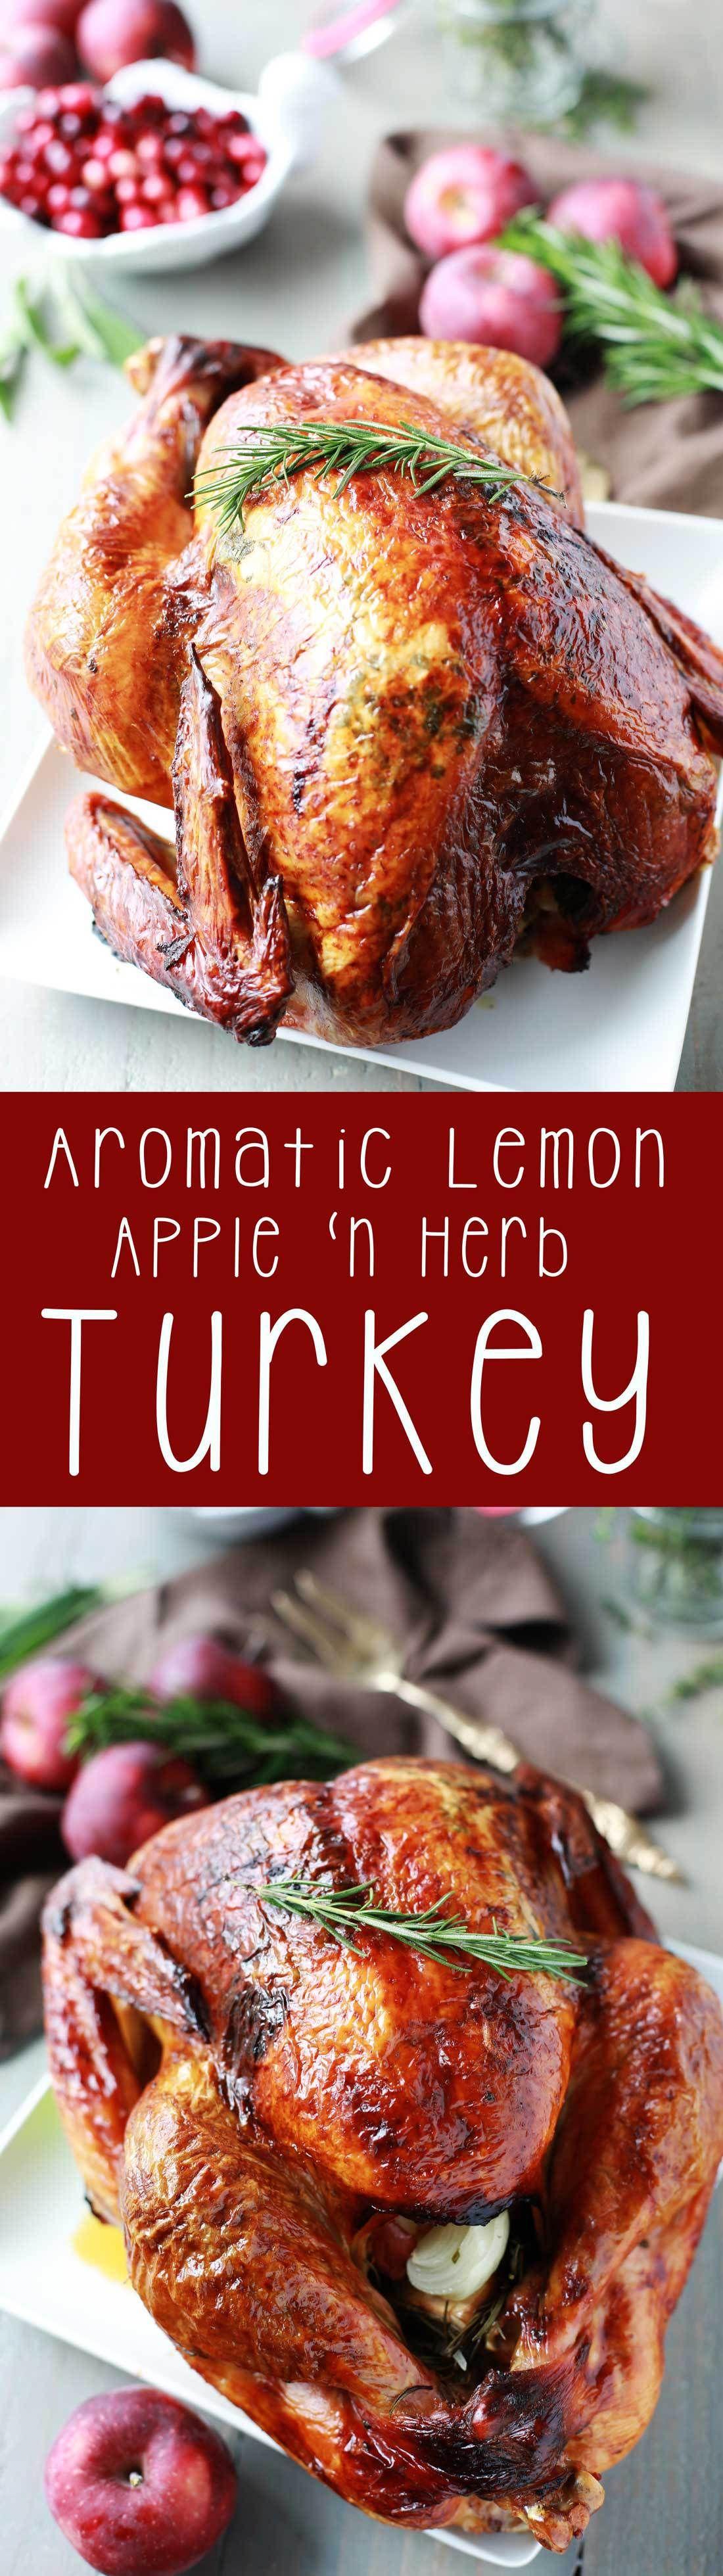 Turkey Recipe Aromatic Lemon Apple And Herb Turkey Tangled With Taste Recipe Cooking Turkey Turkey Recipes Recipes